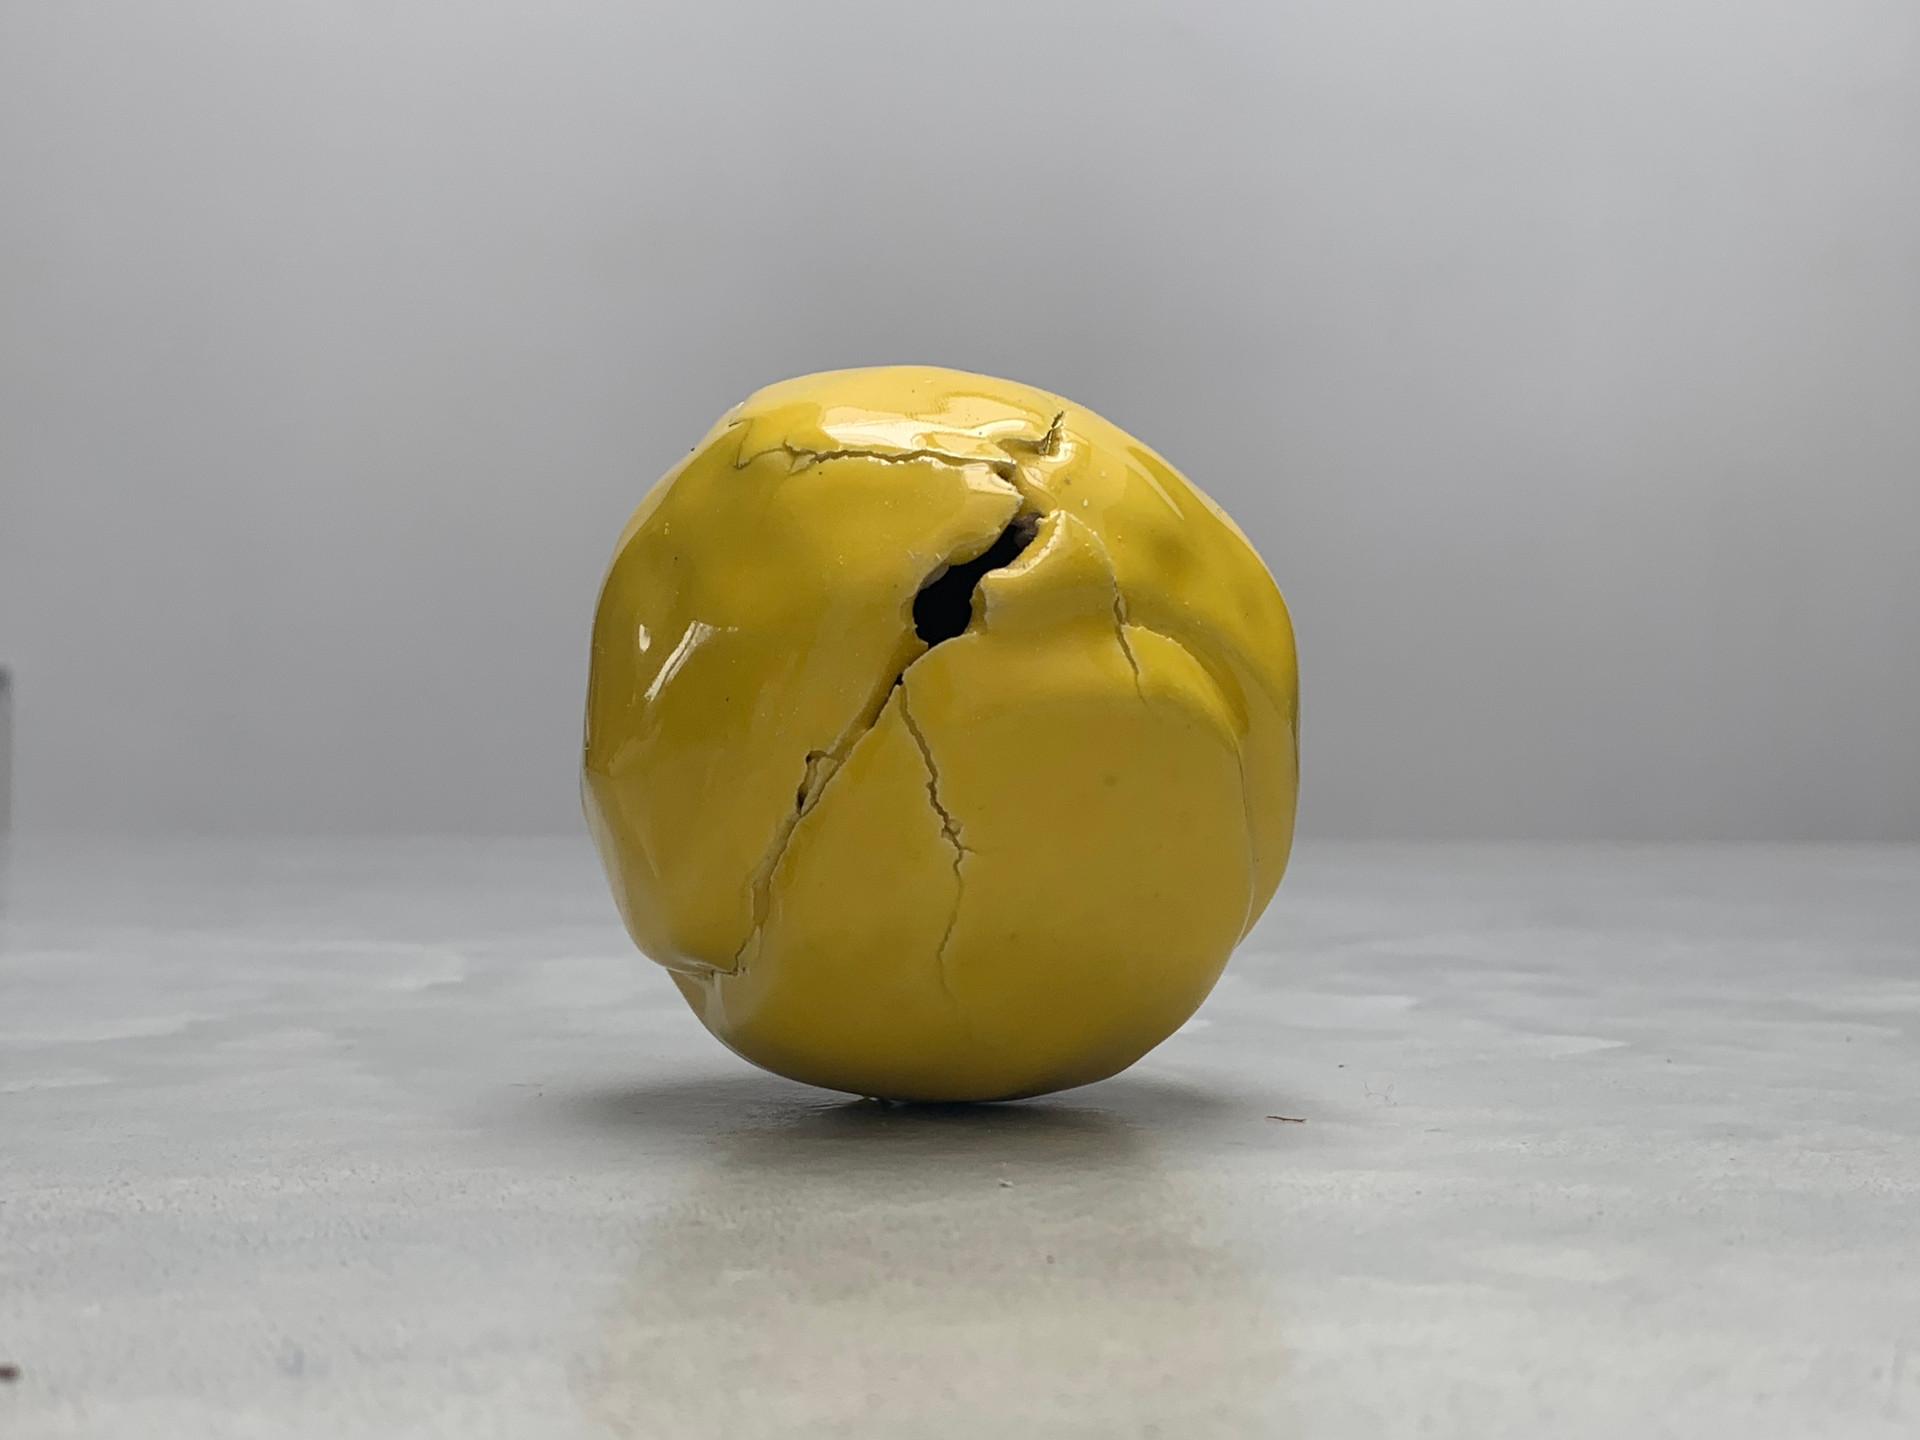 Untitled, 2019 Glazed ceramic 3 x 3 x 3 inches